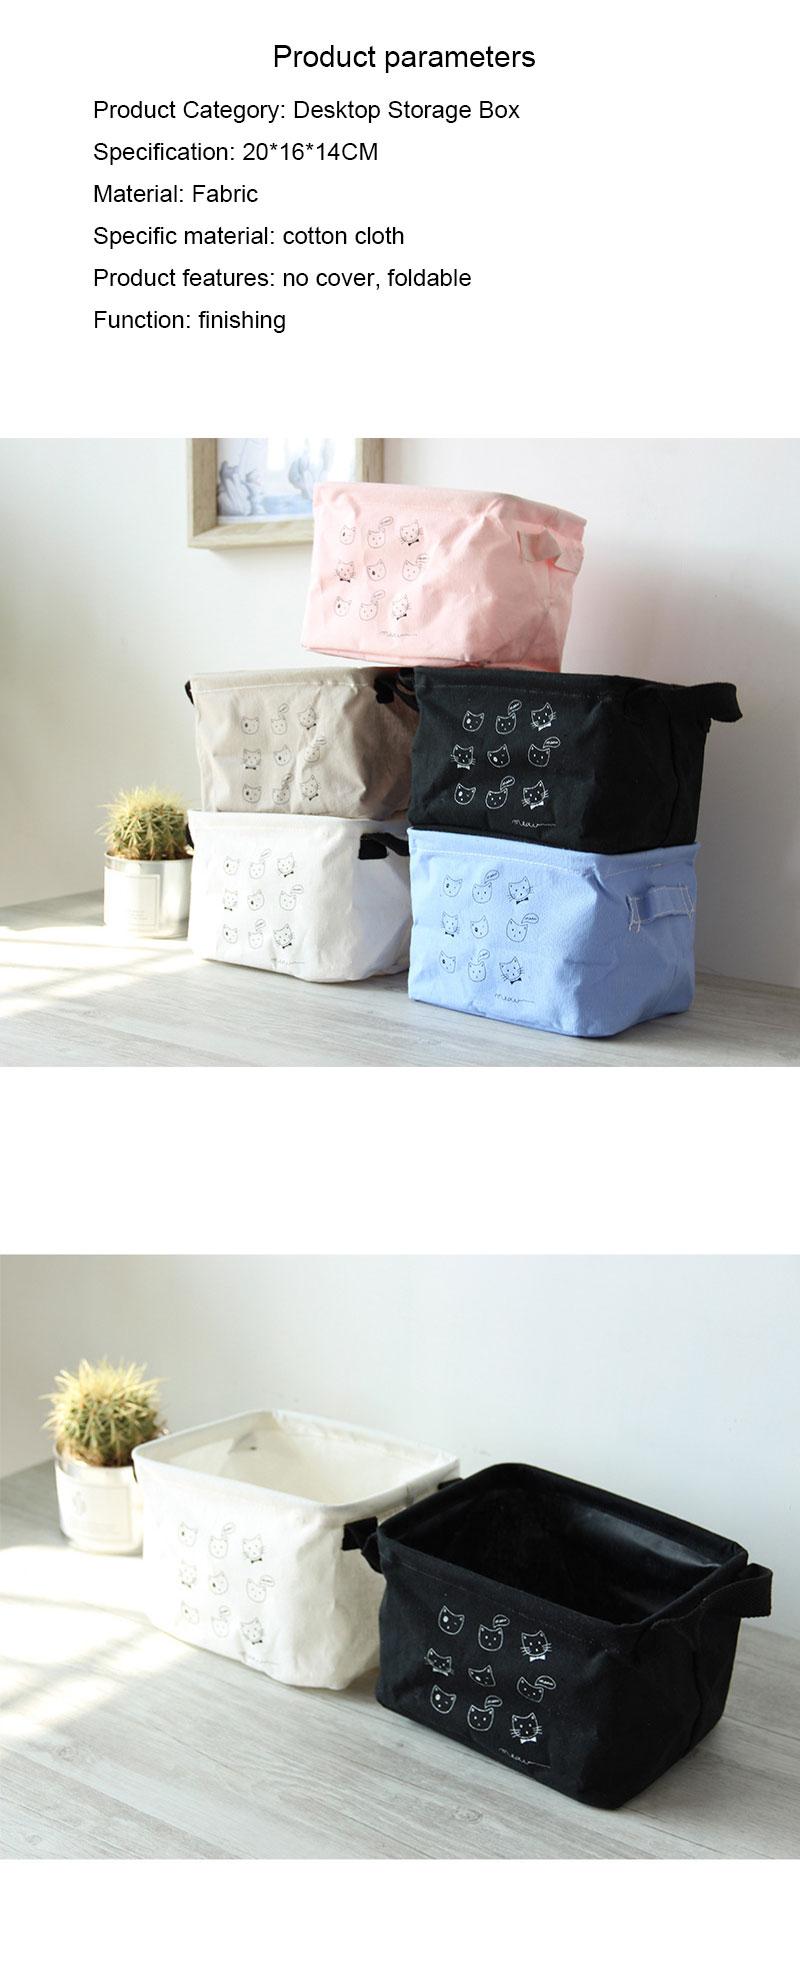 Fabric Multi-function Desktop Tissue Box Cotton And Linen Tissue Holder Cover YI